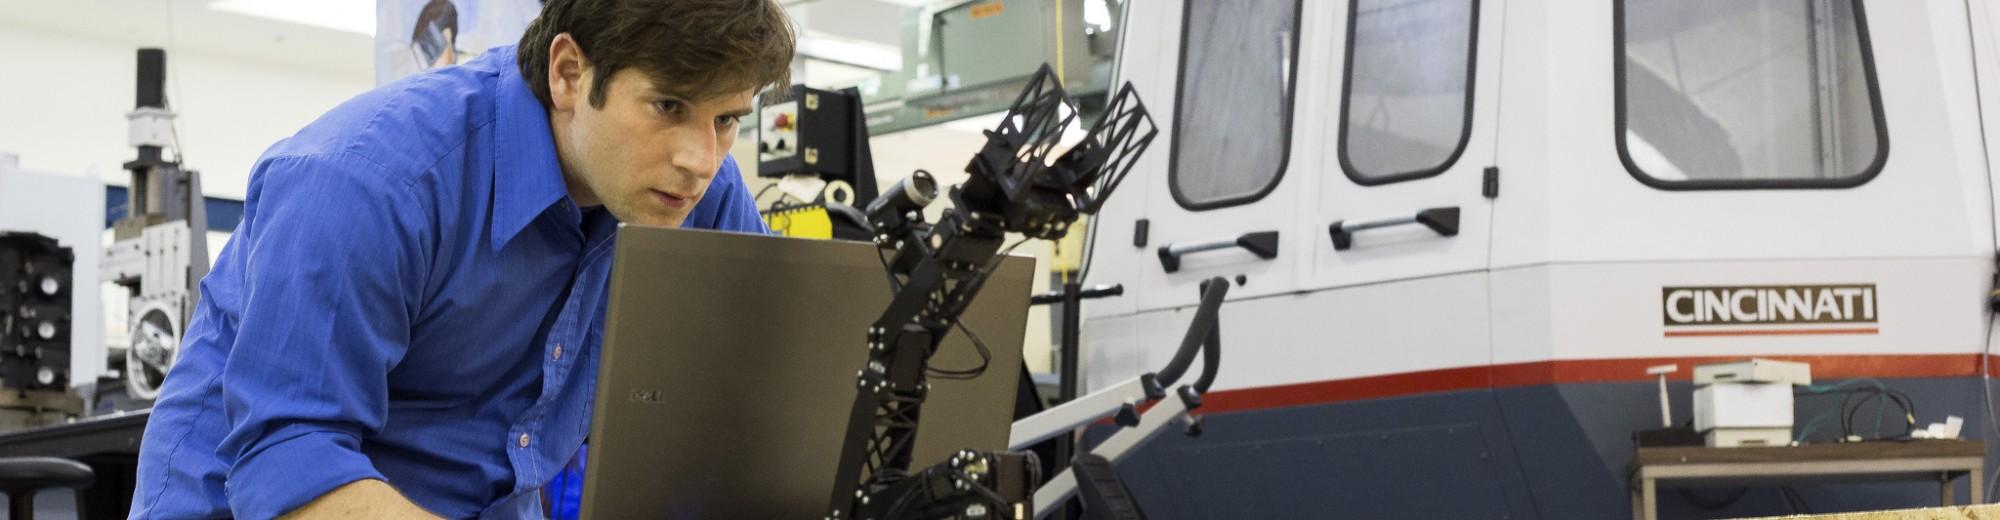 Human robot interaction phd thesis